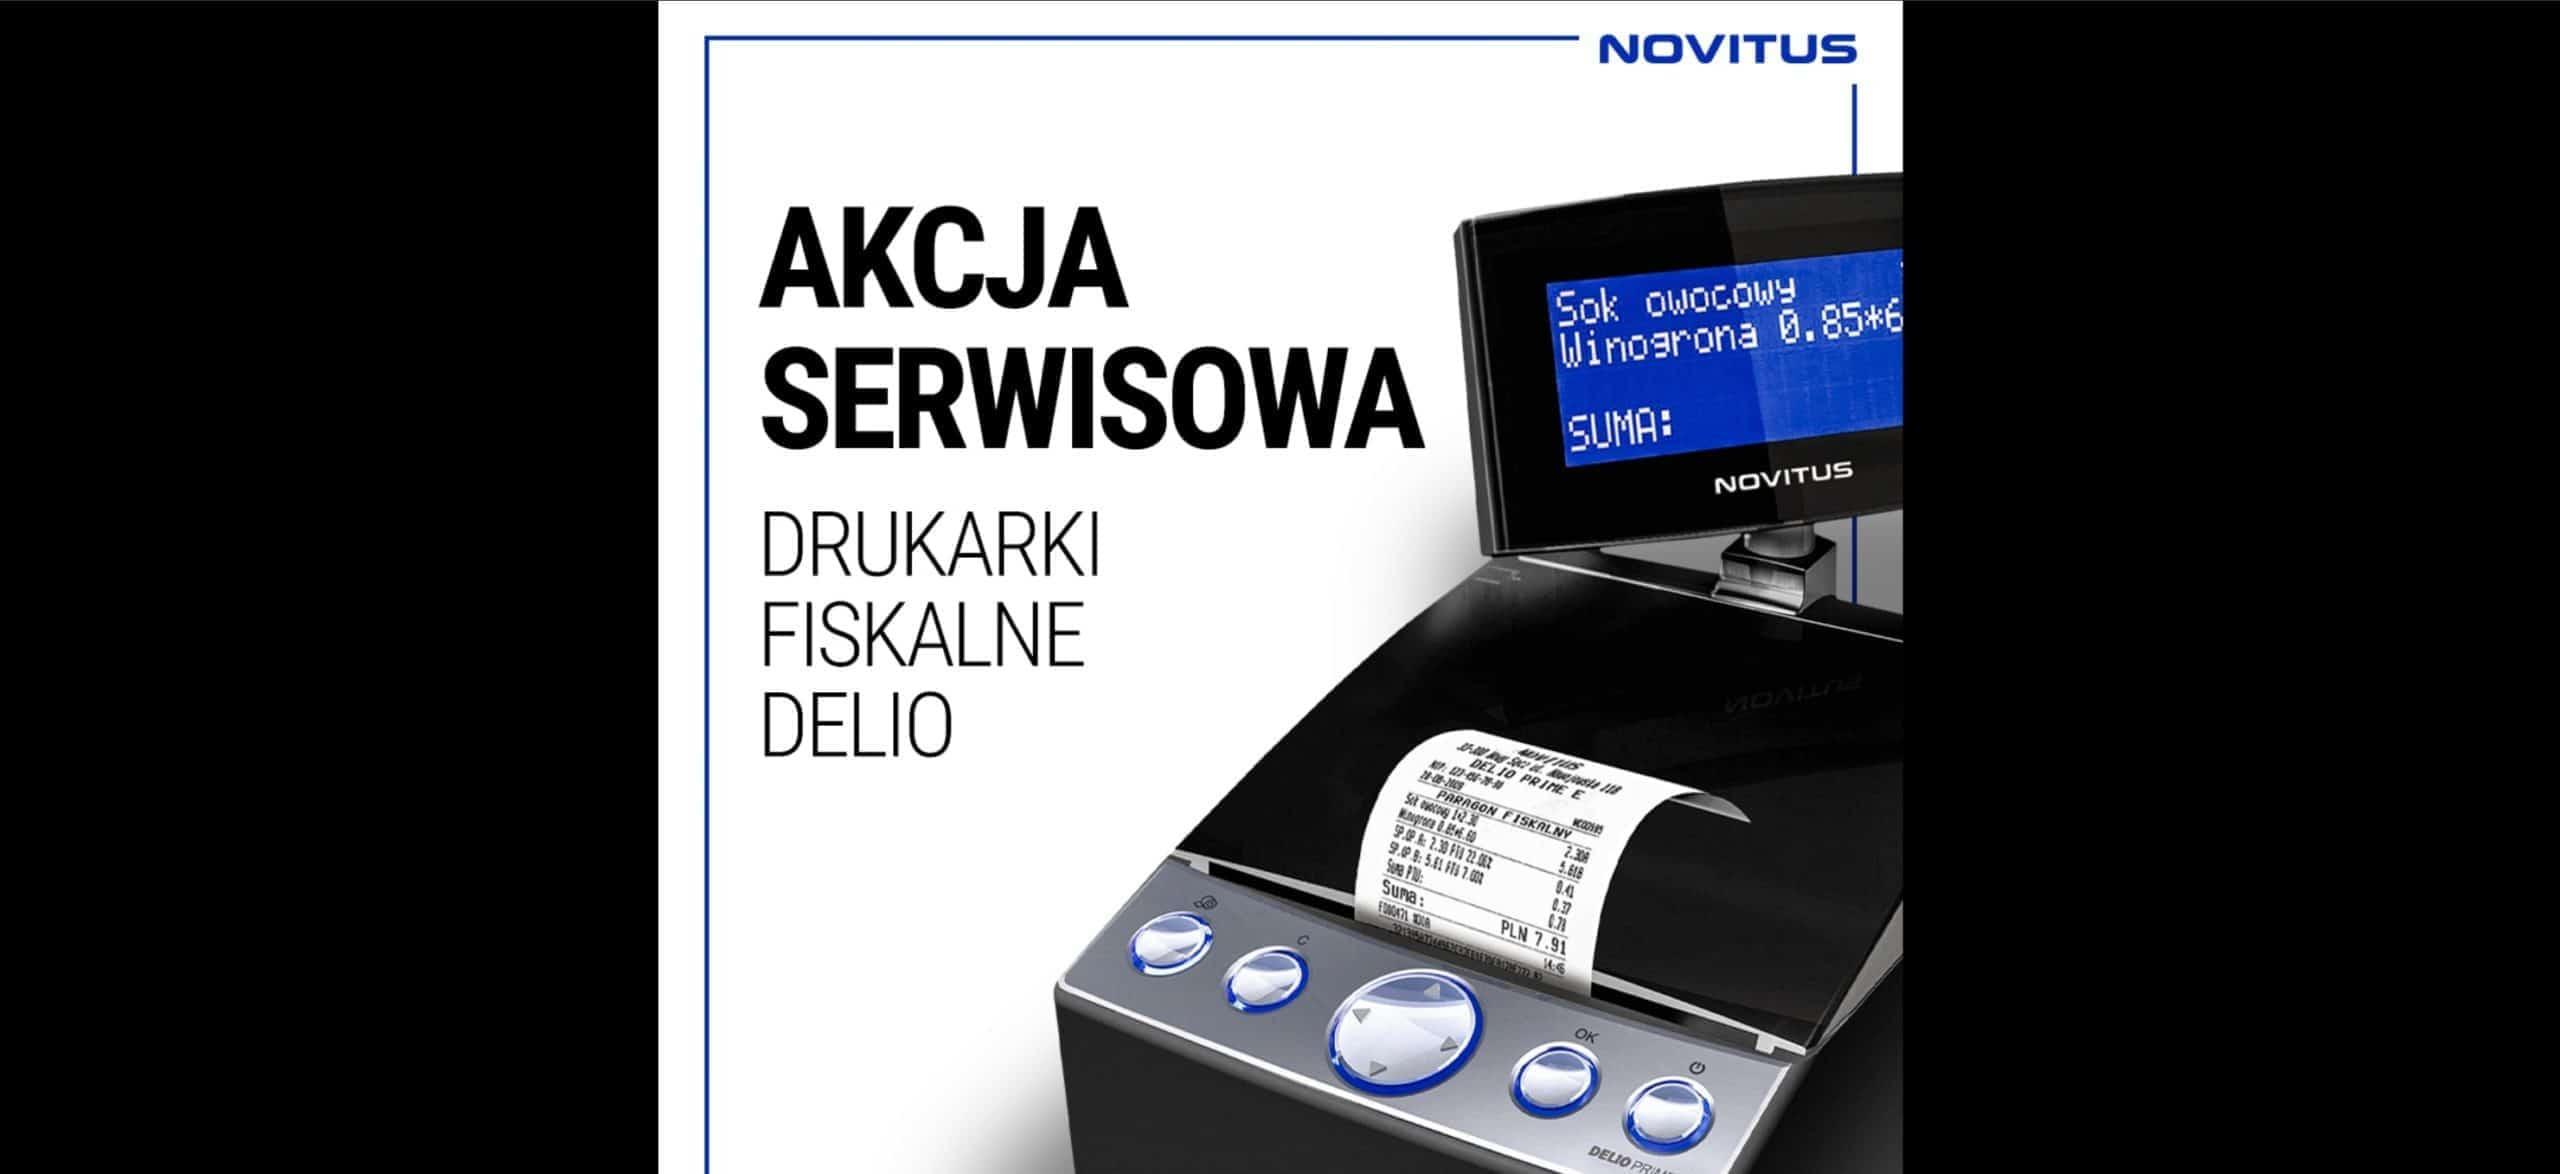 Novitus DELIO akcja serwisowa 2020